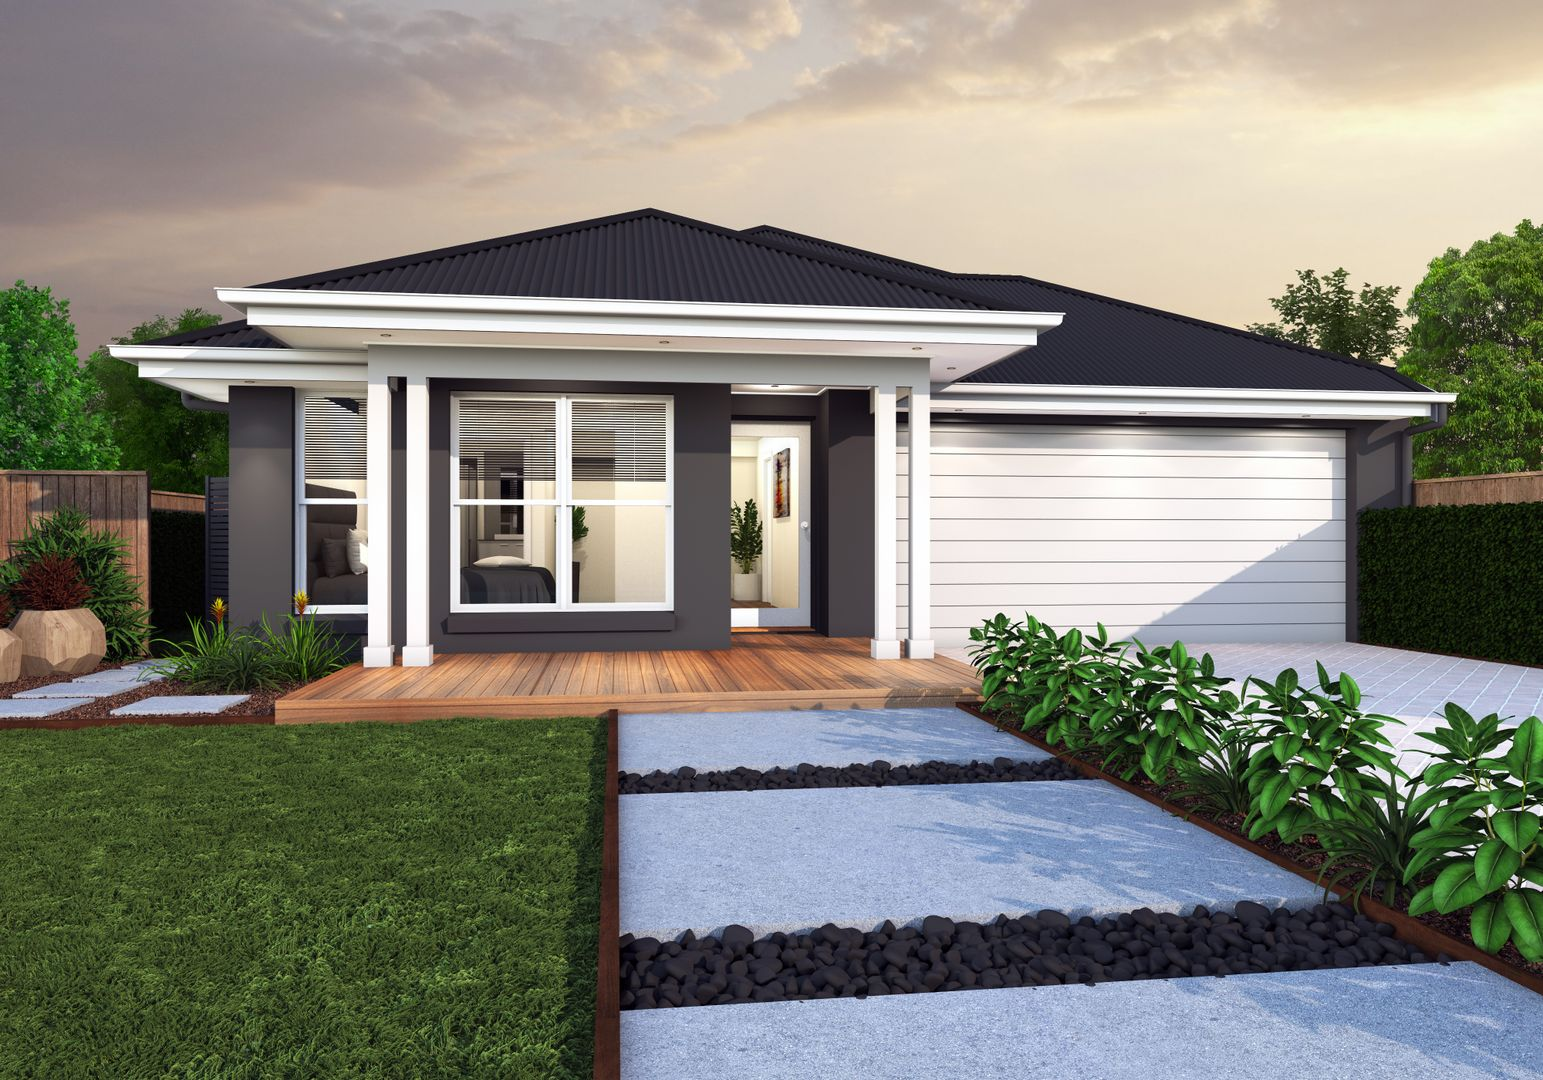 Lot 5022 Bentley Road, Kembla Grange NSW 2526, Image 0